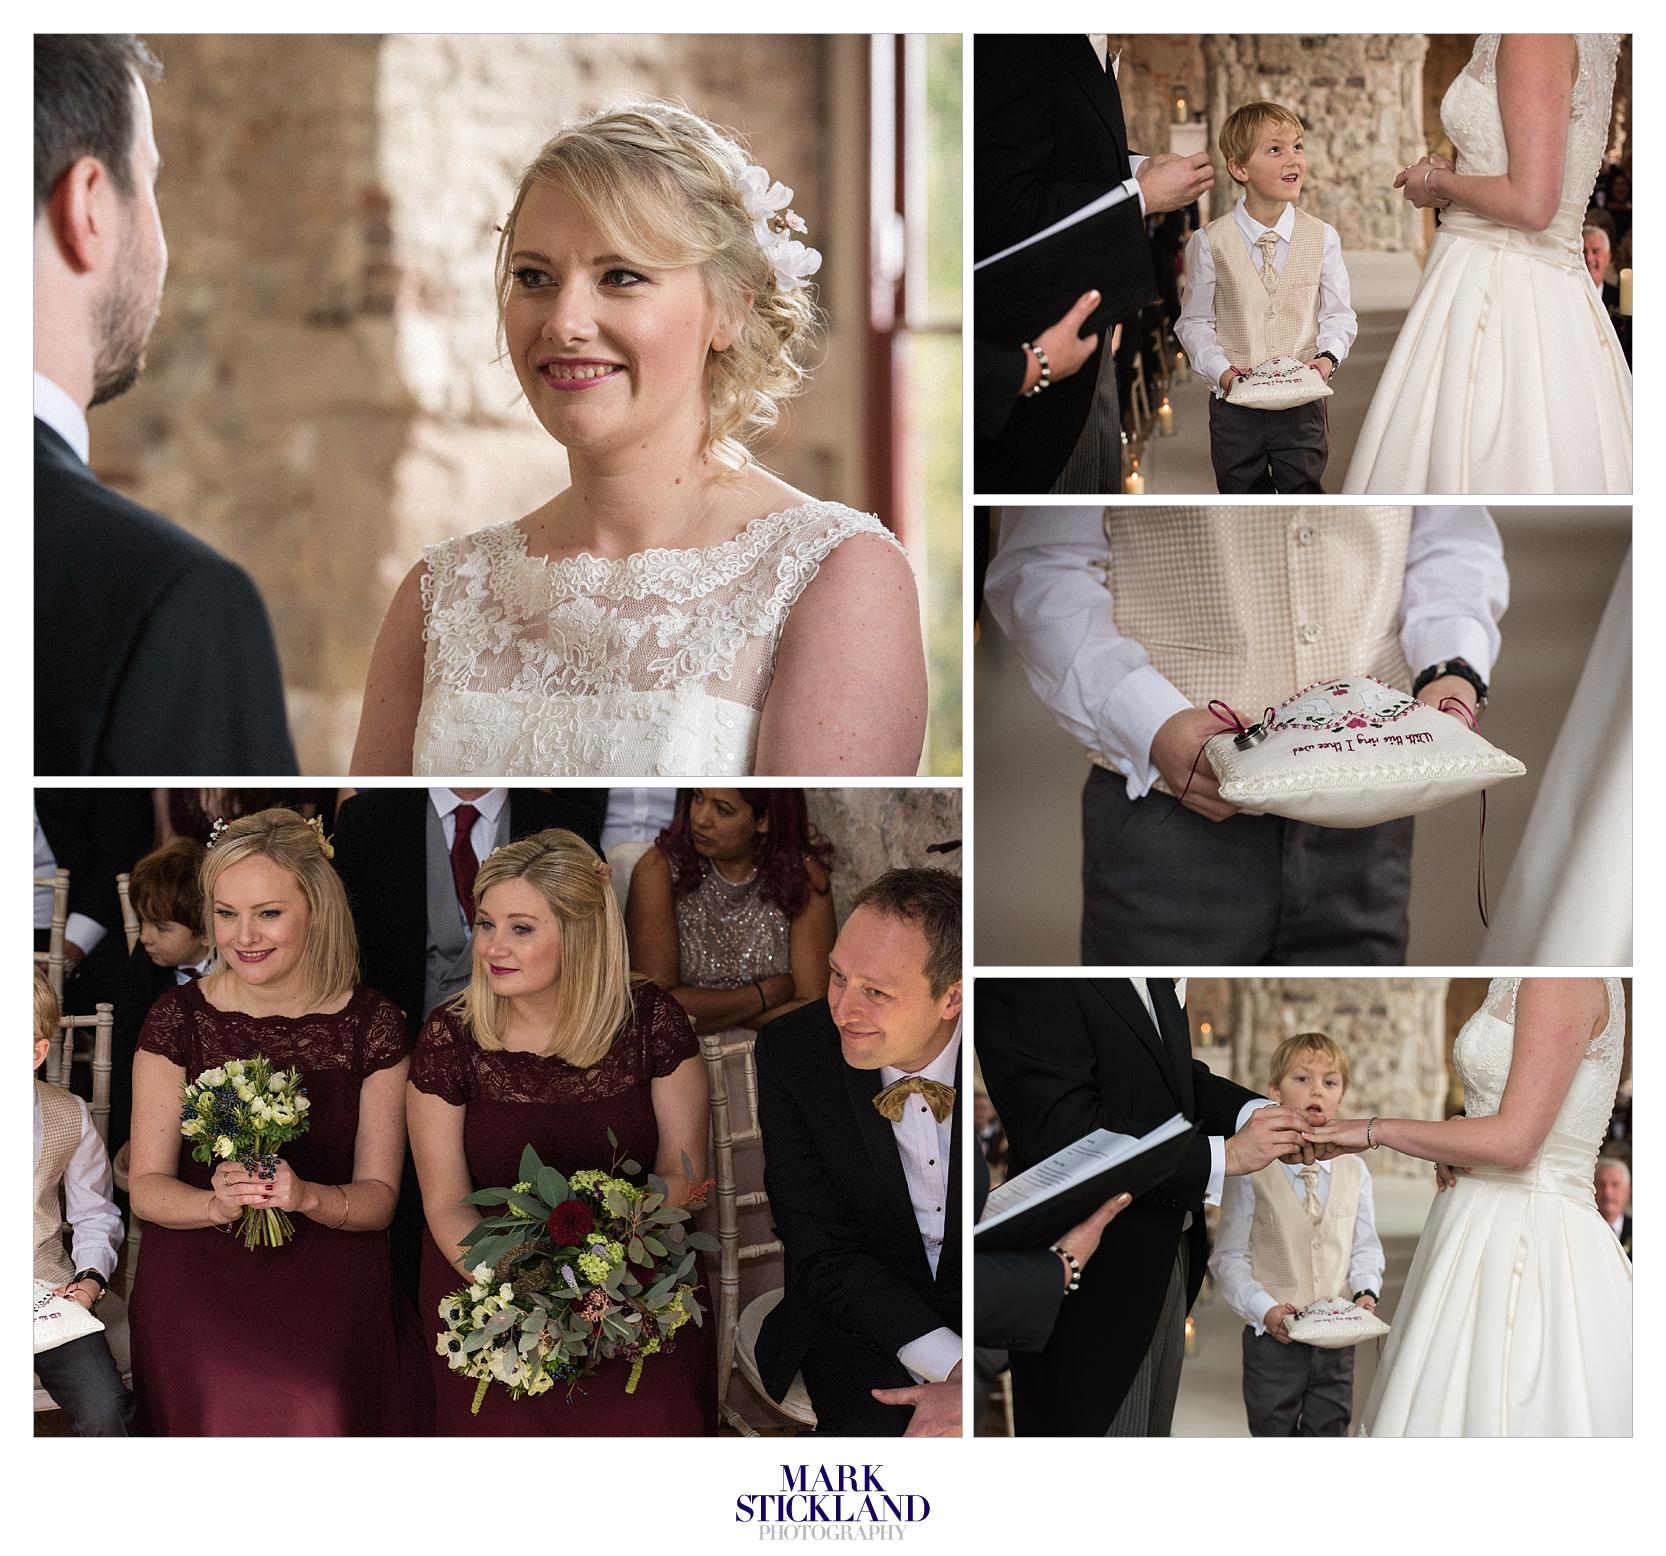 lulworth_castle_wedding_dorset_mark stickland photography.10